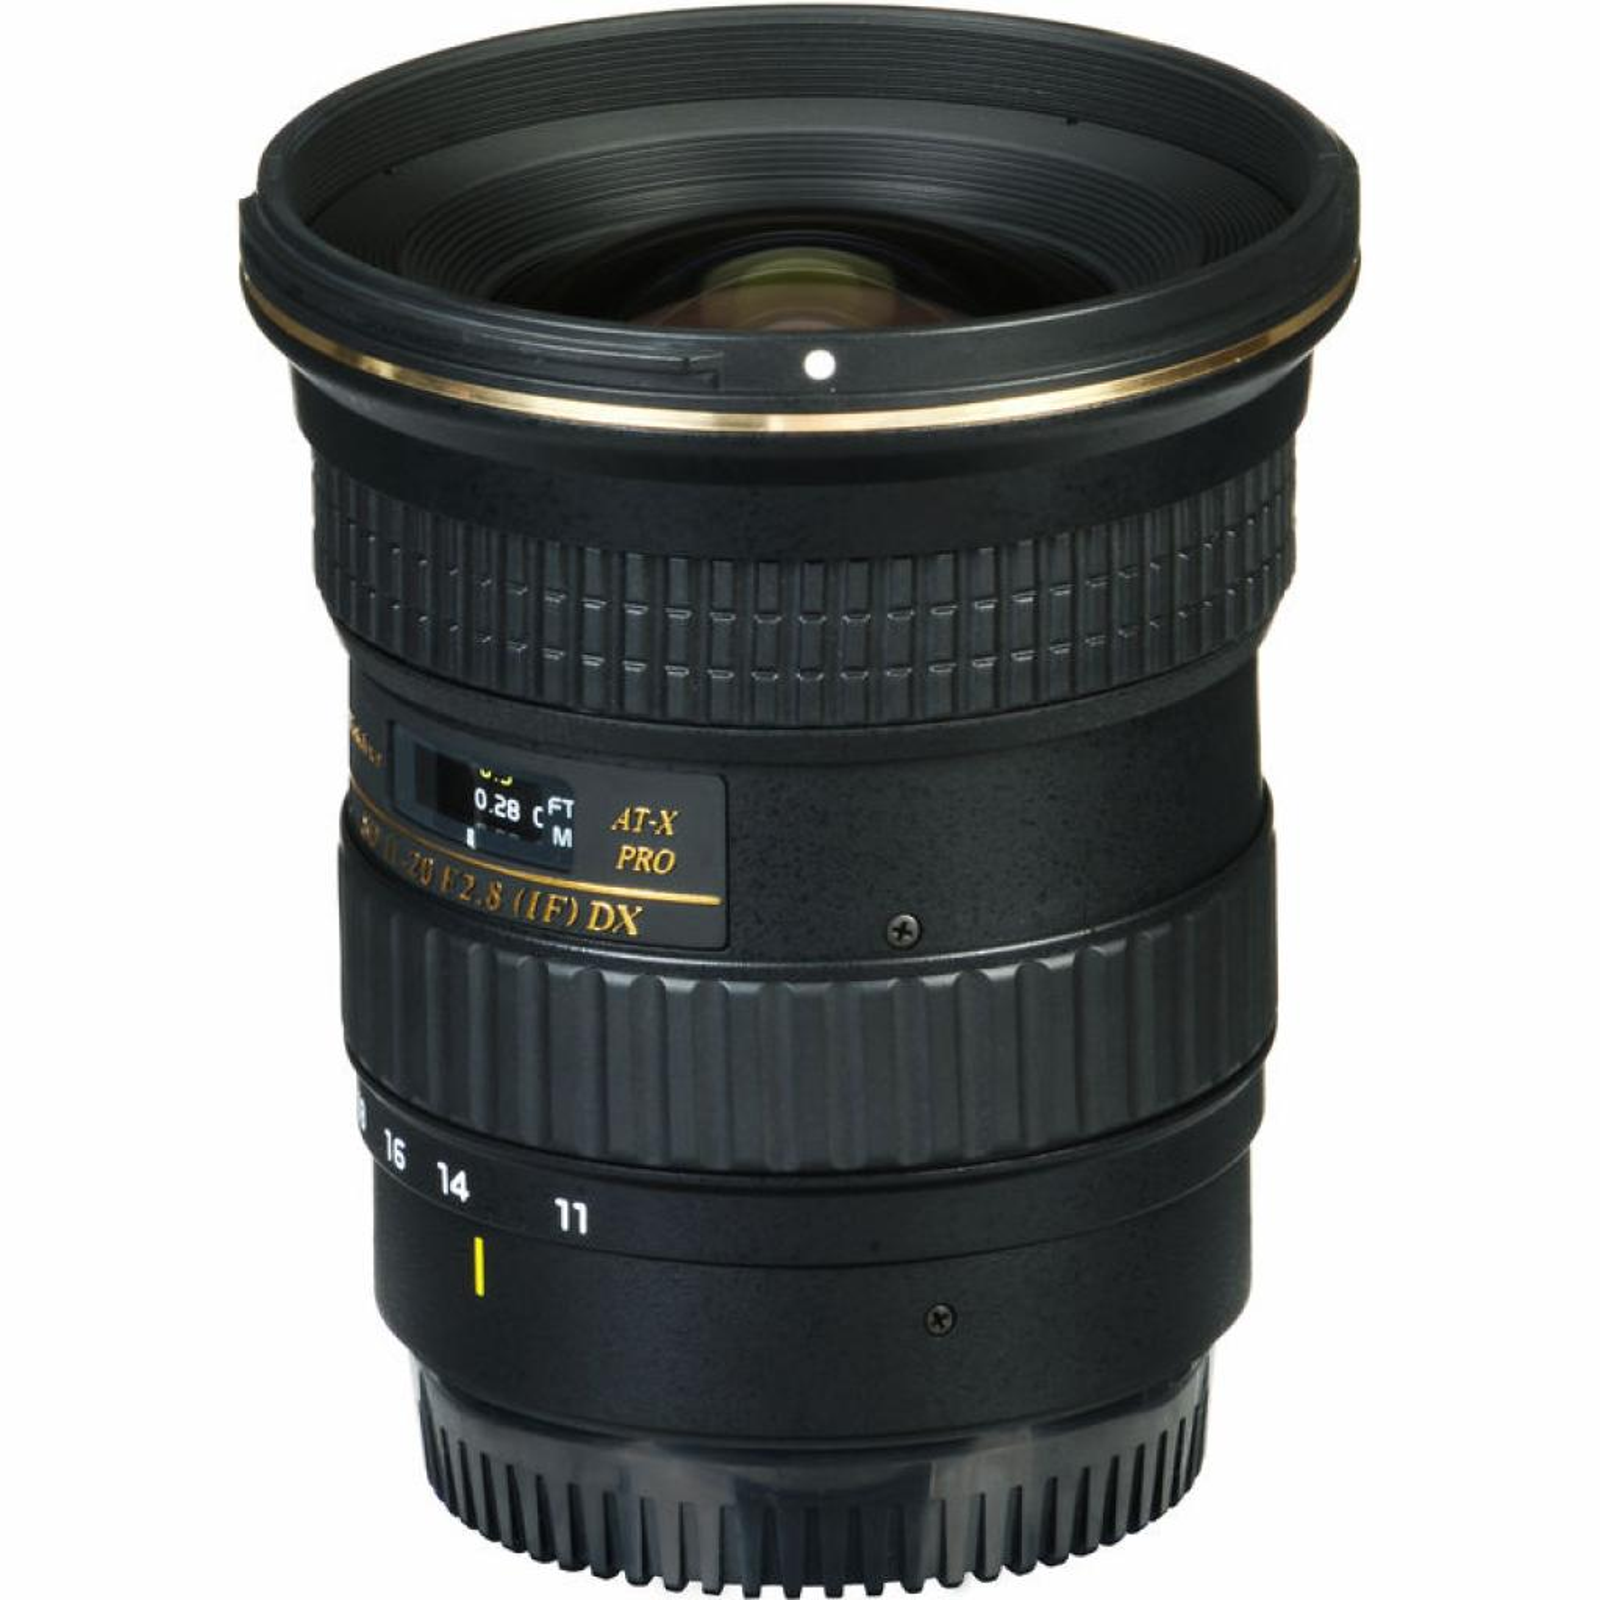 Объектив Tokina AT-X PRO DX 11-20mm f/2.8 (Canon) (ATXAF120DXC) изображение 4